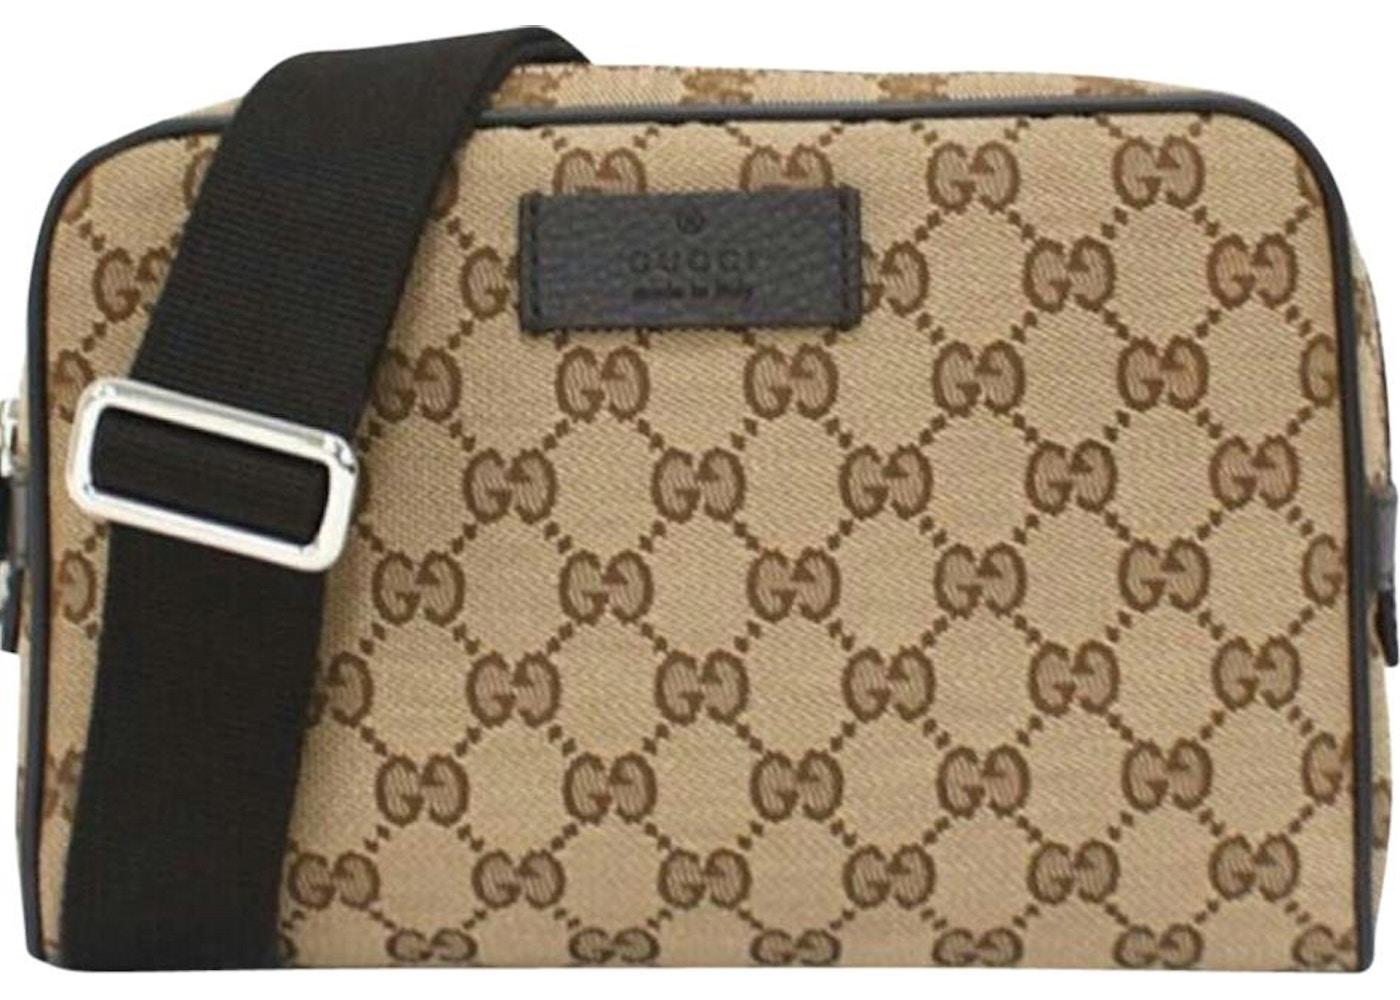 dadeff57da5 Buy   Sell Gucci Luxury Handbags